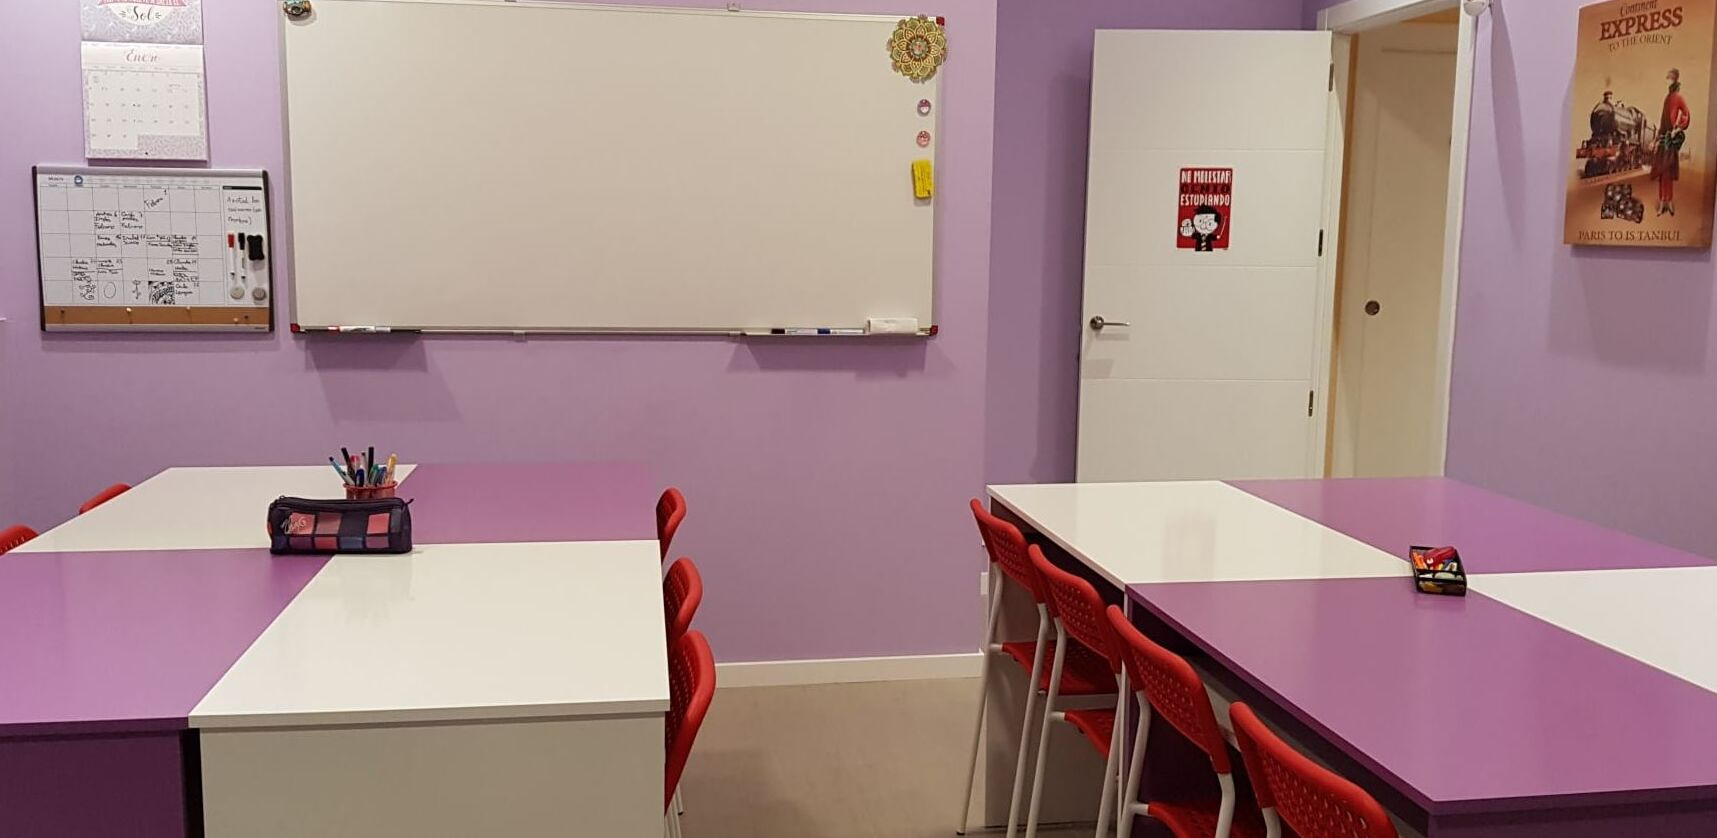 Centro de estudios Eureka Zaragoza